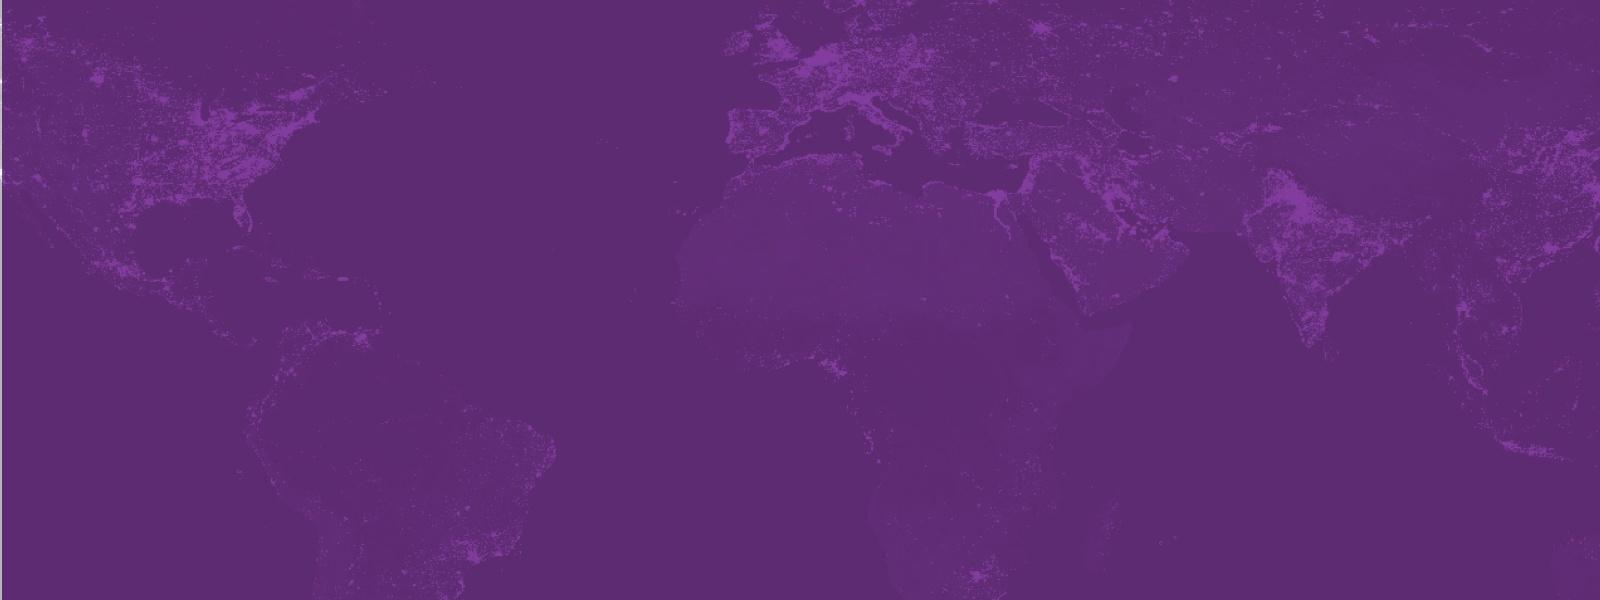 Purple bg.jpg